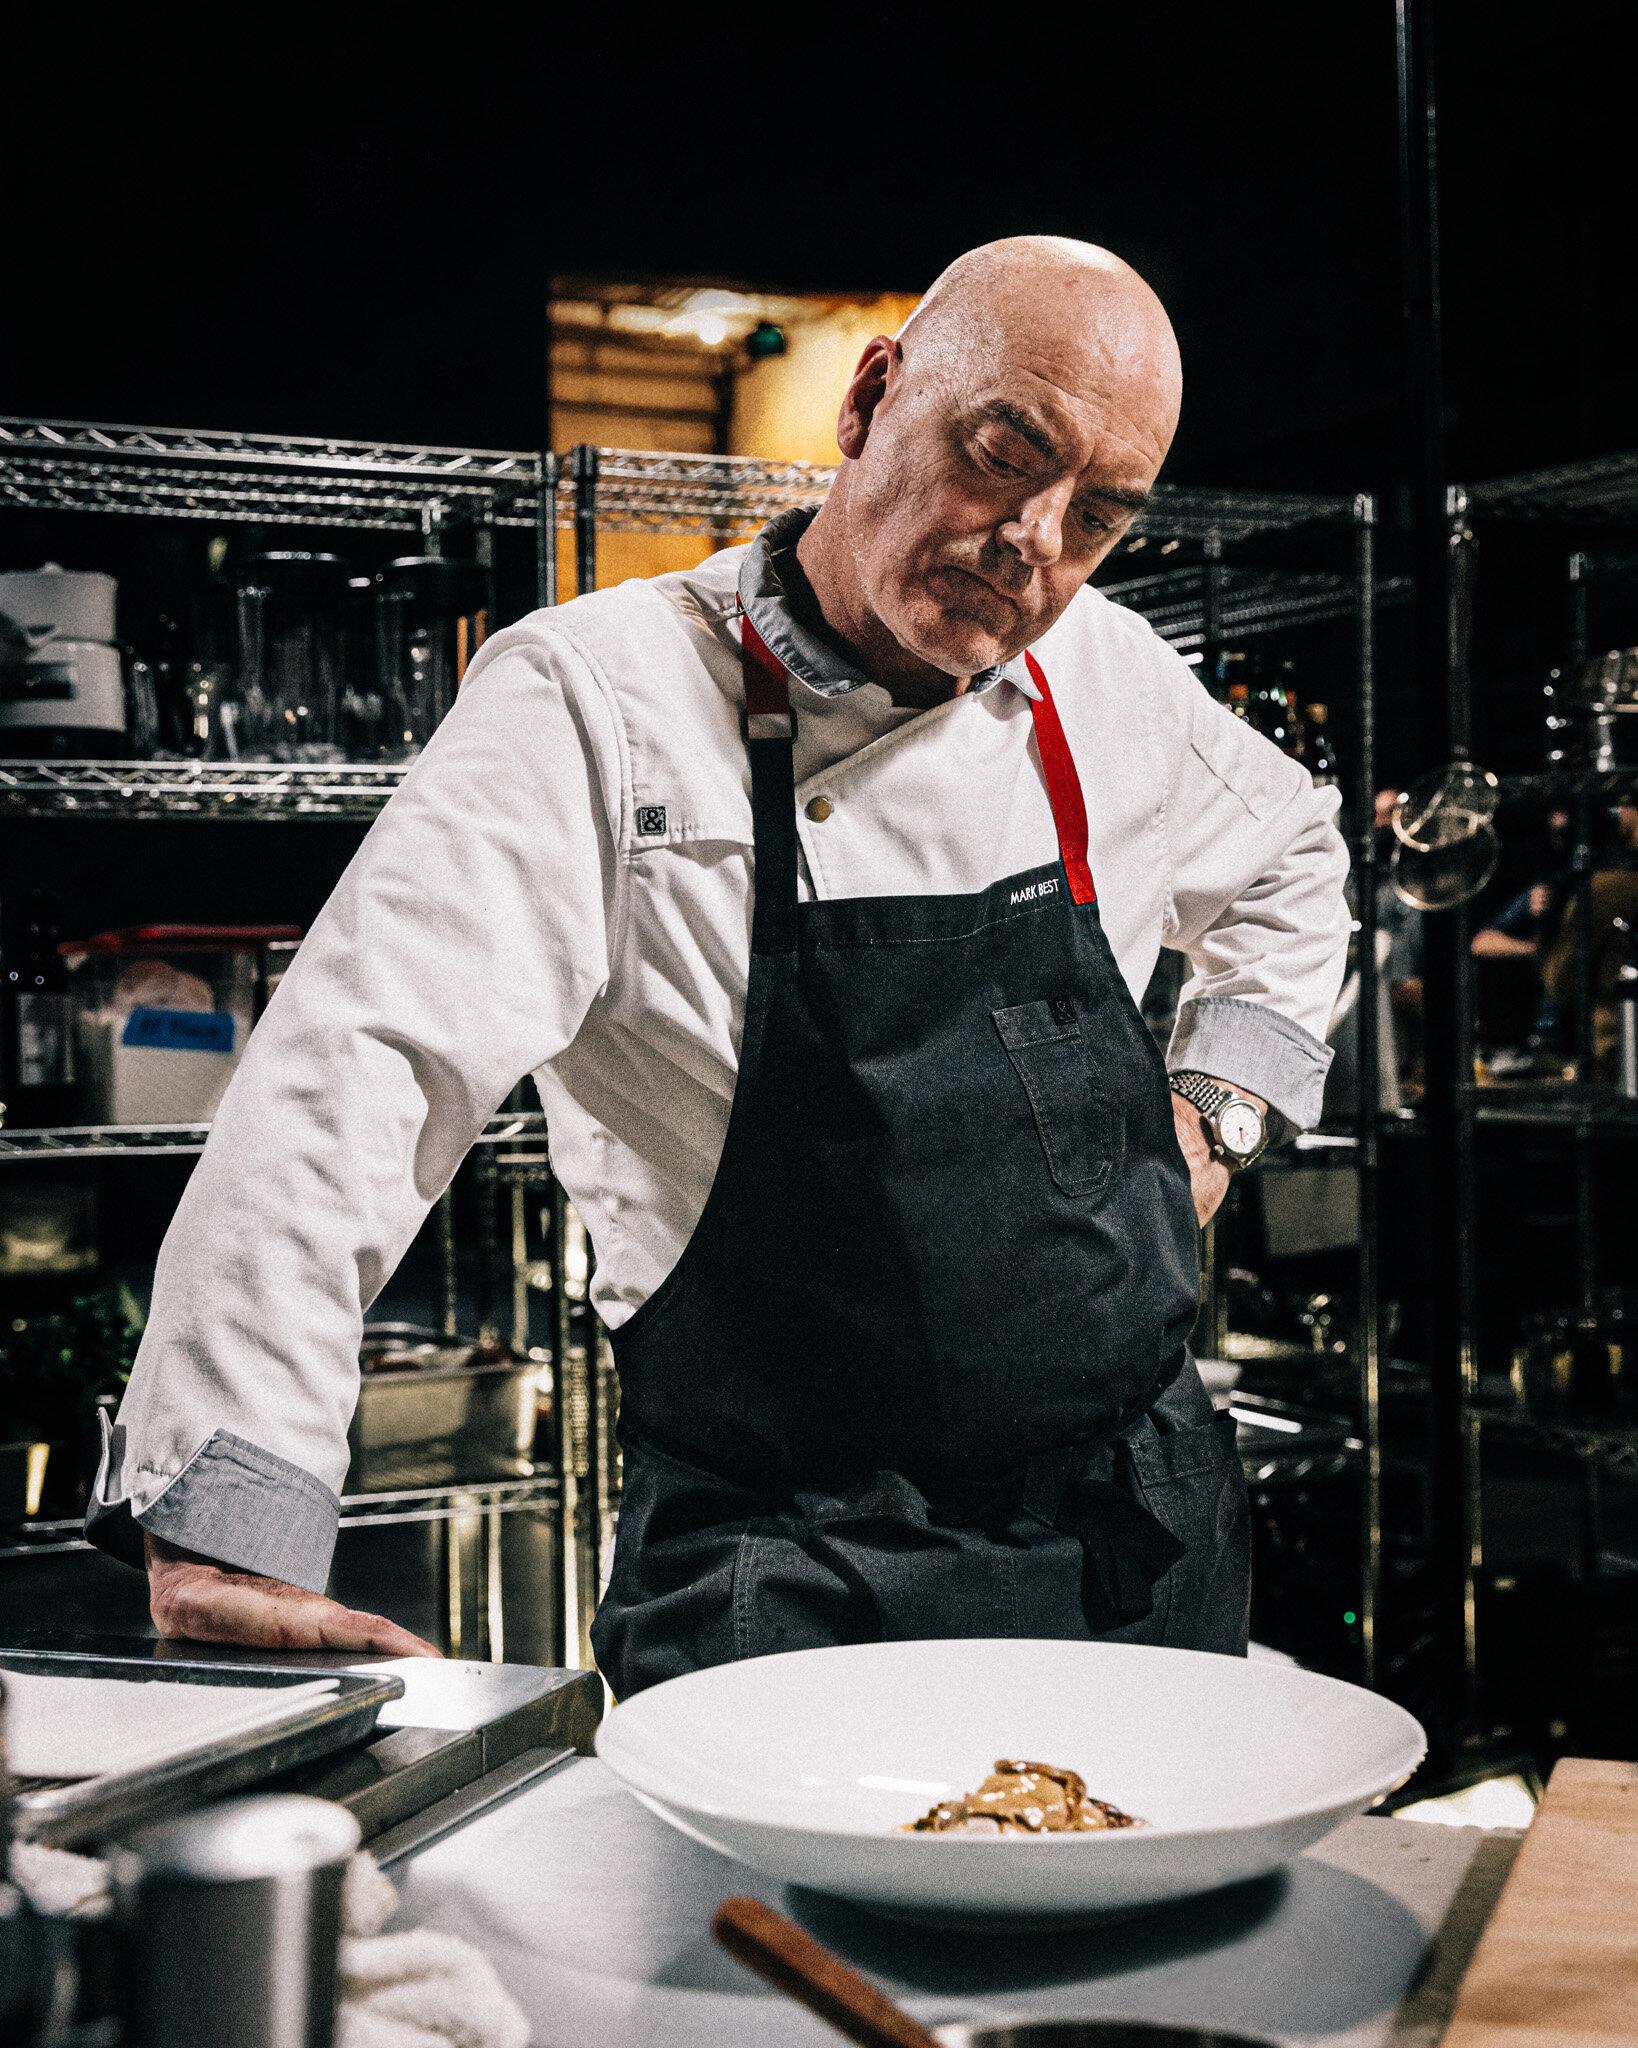 Kit-Karzen-Chef-Mark-Best-Netflix.jpg